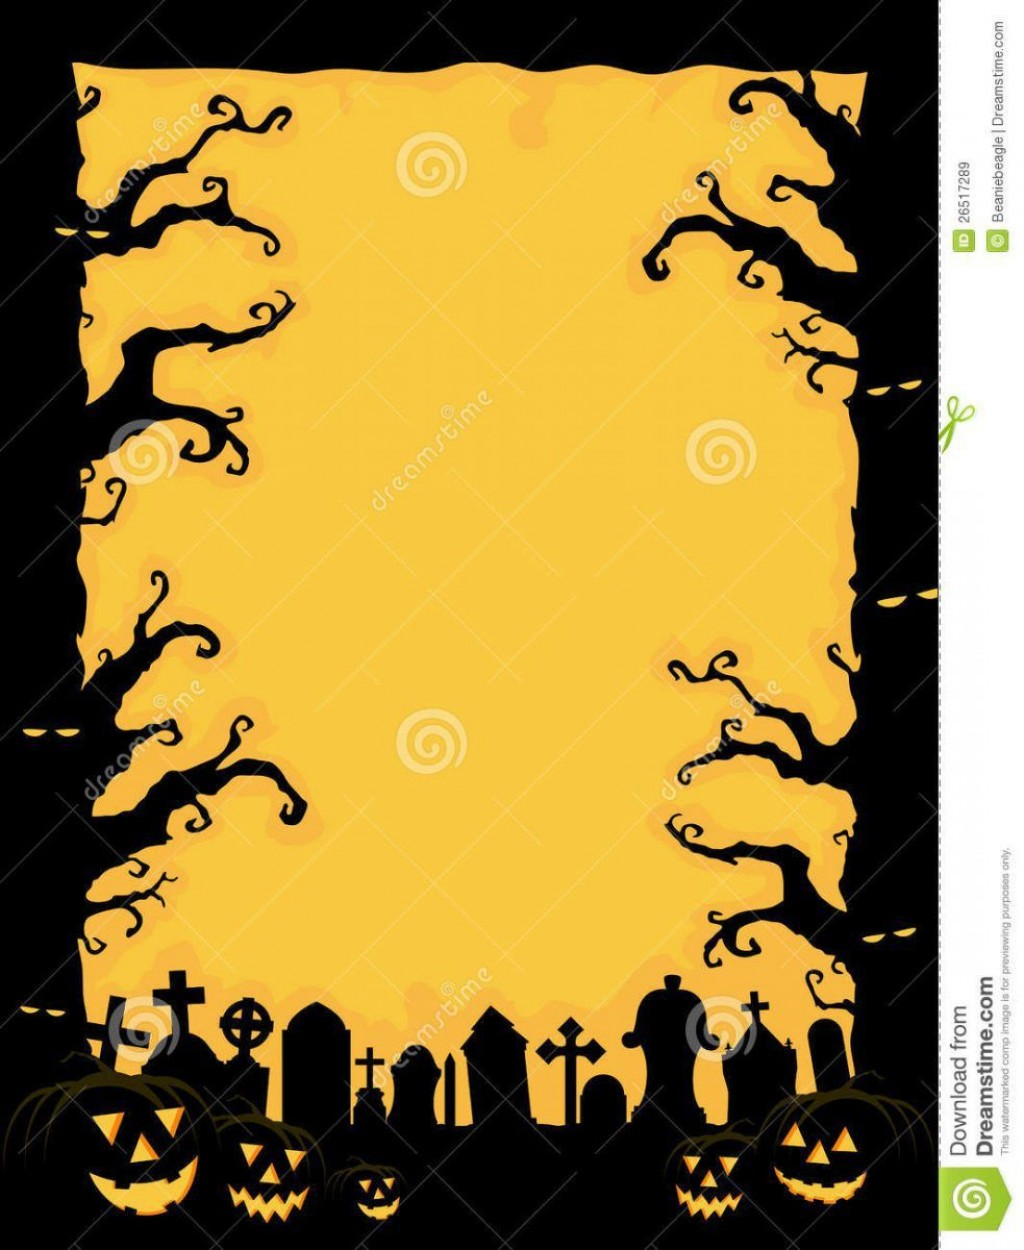 005 Stirring Free Halloween Invitation Template Idea  Templates Online Printable Birthday Party WeddingLarge